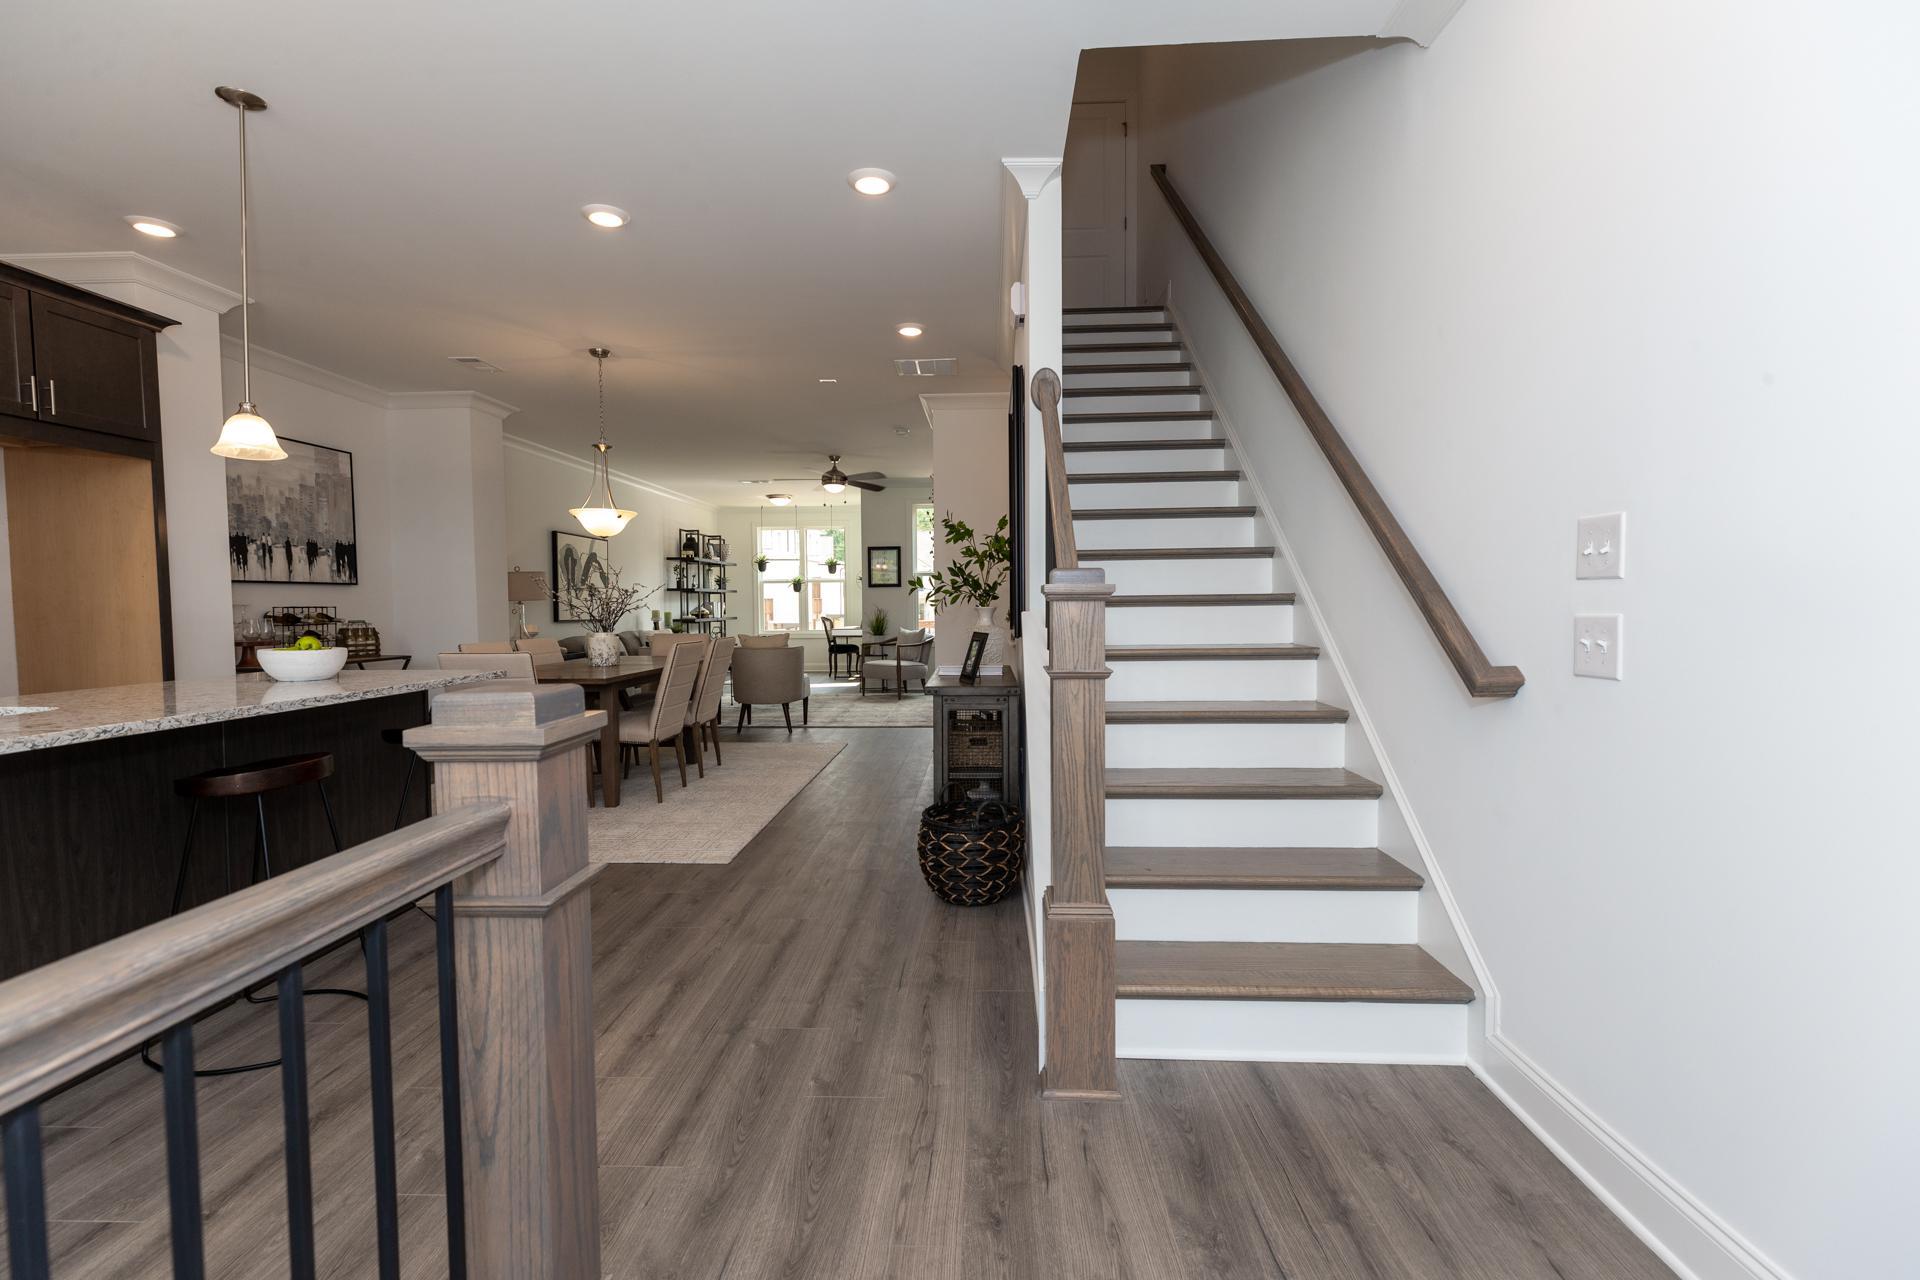 The Garwood New Home in Suwanee GA